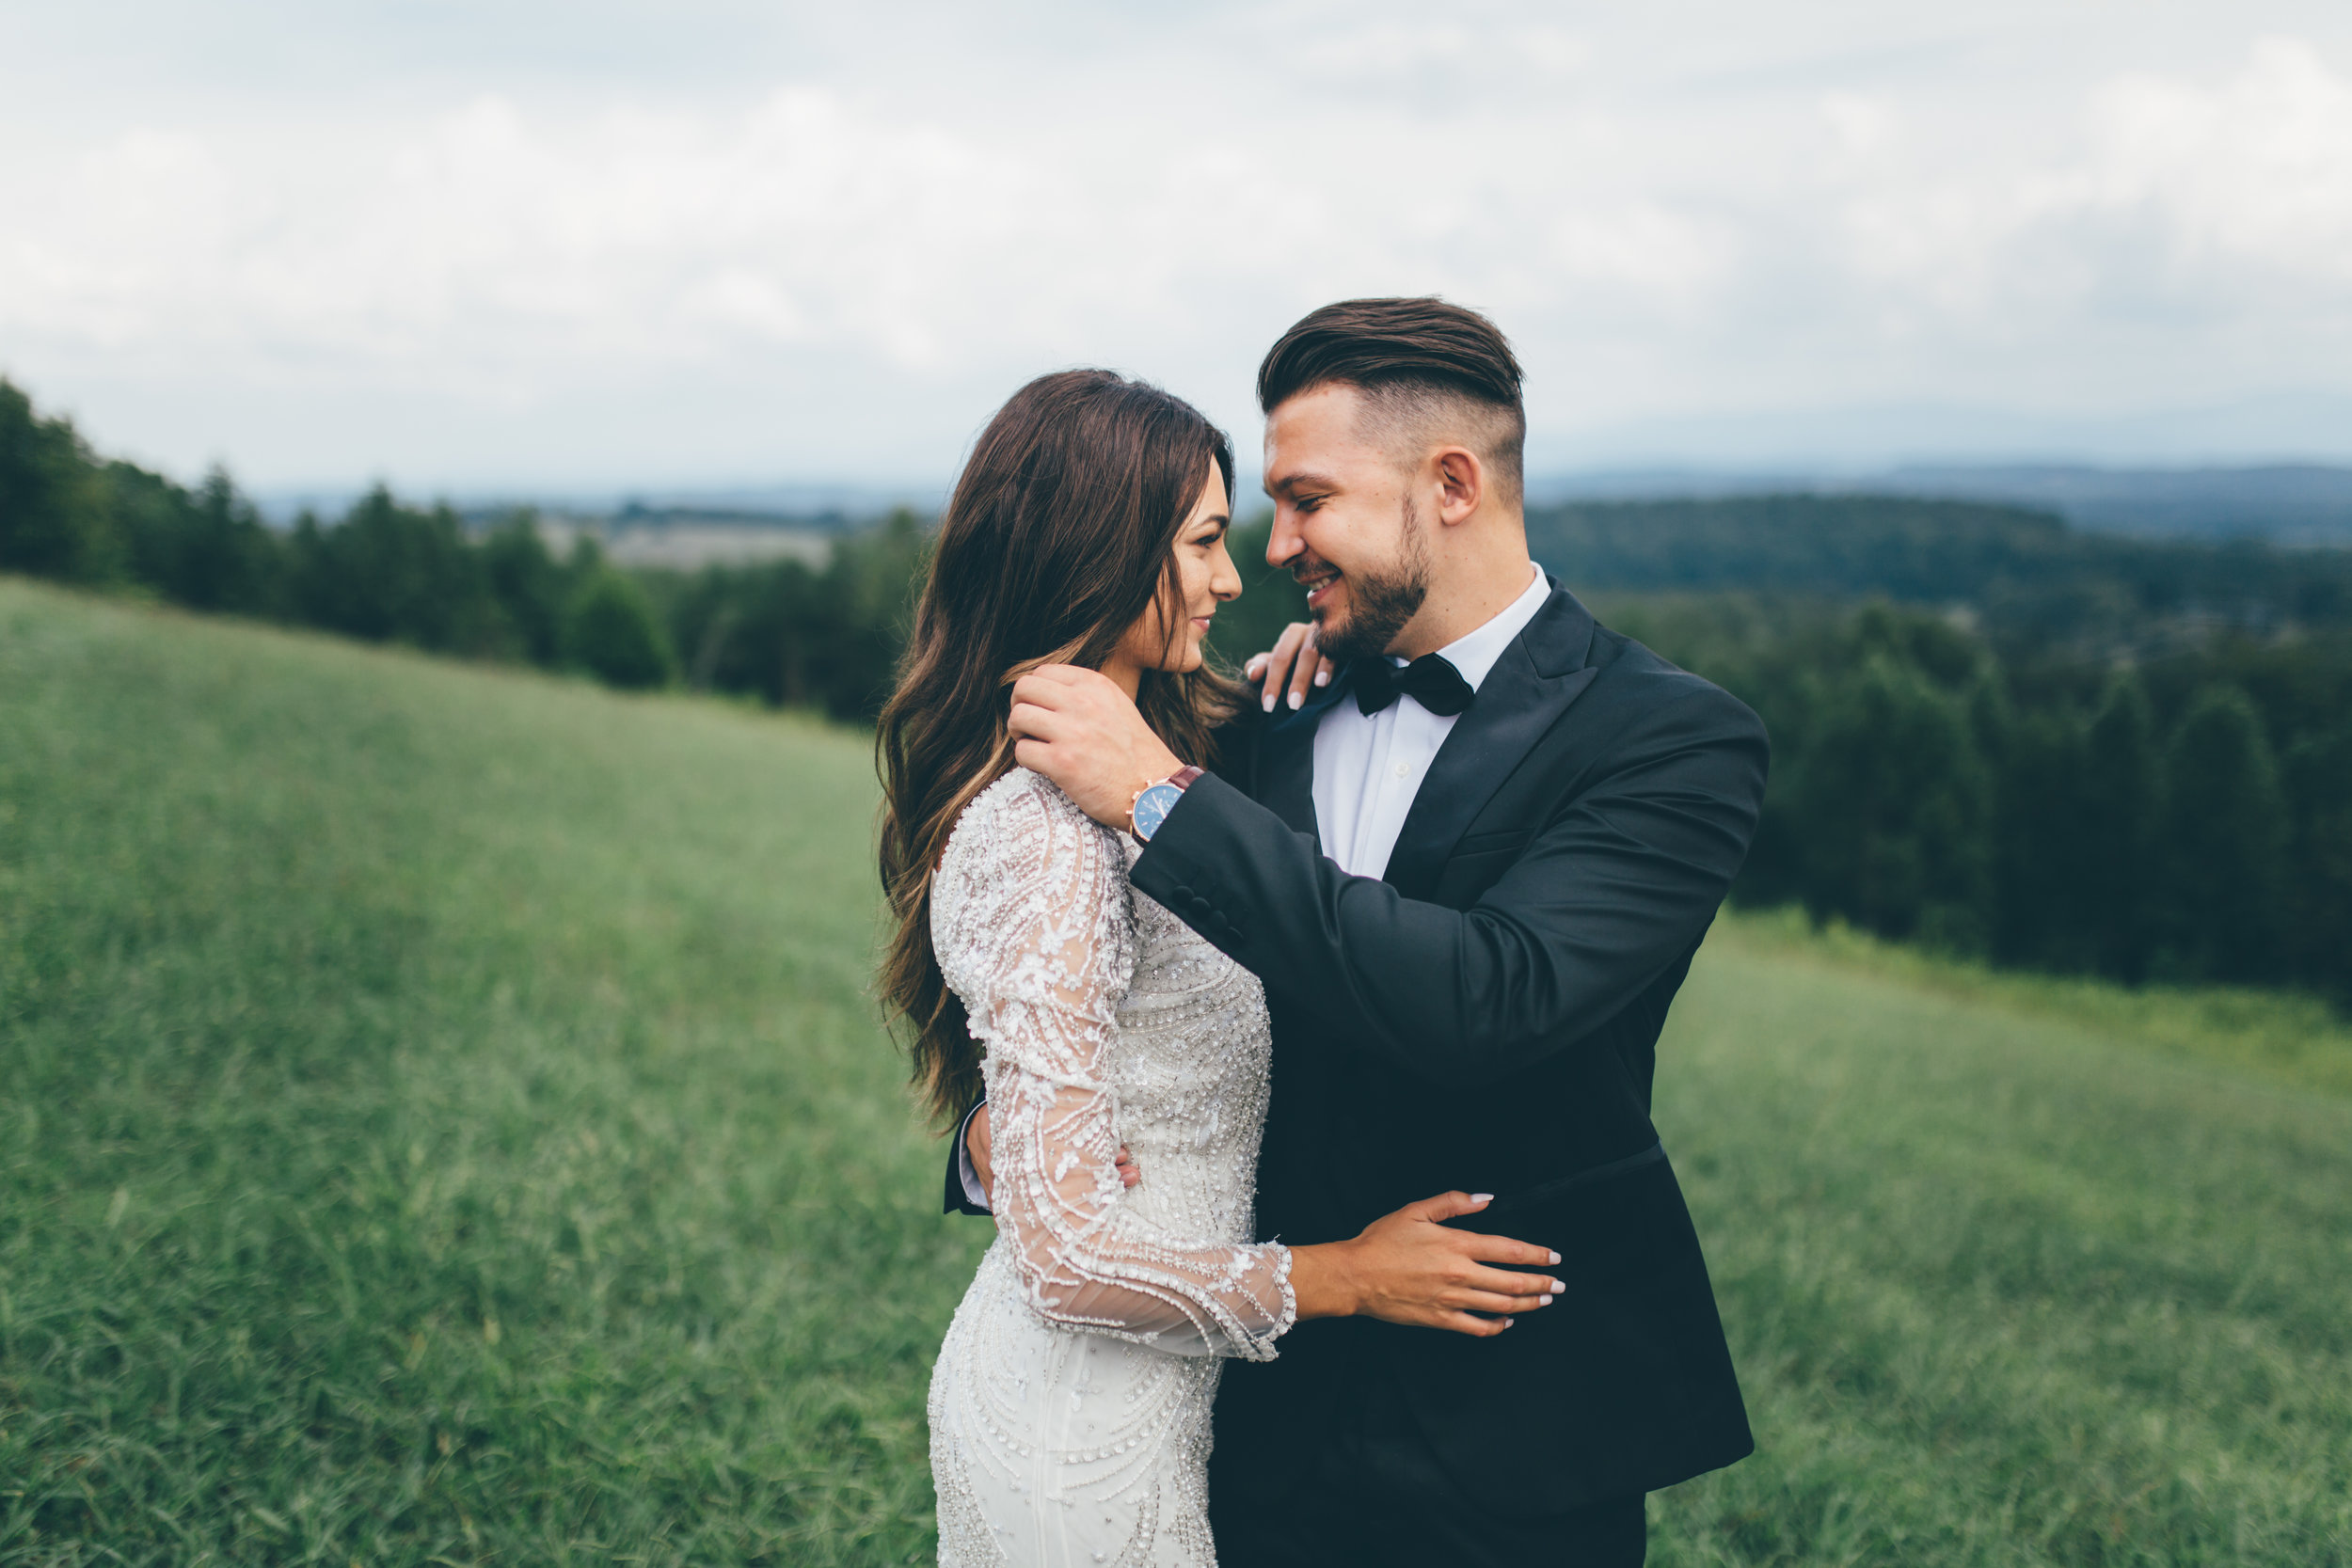 Liza & Dan Galay - September 8, 2018Amber Phinisee Photography